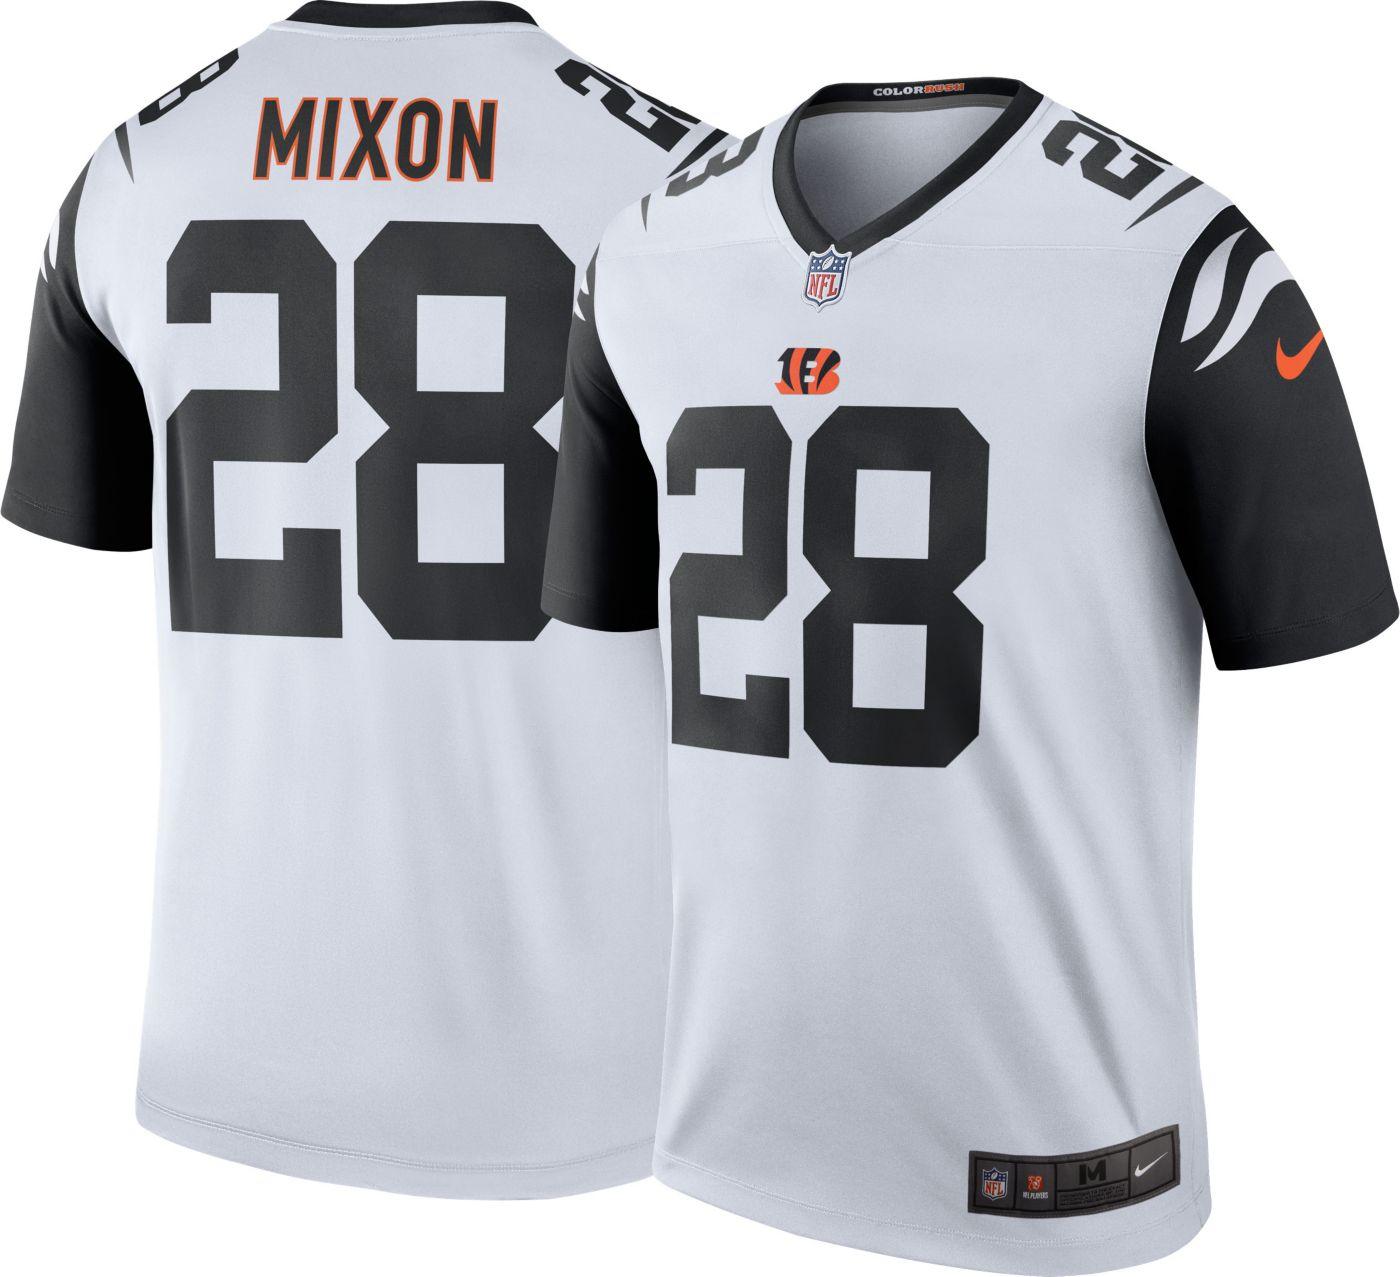 Nike Men's Color Rush Legend Jersey Cincinnati Bengals Joe Mixon #28